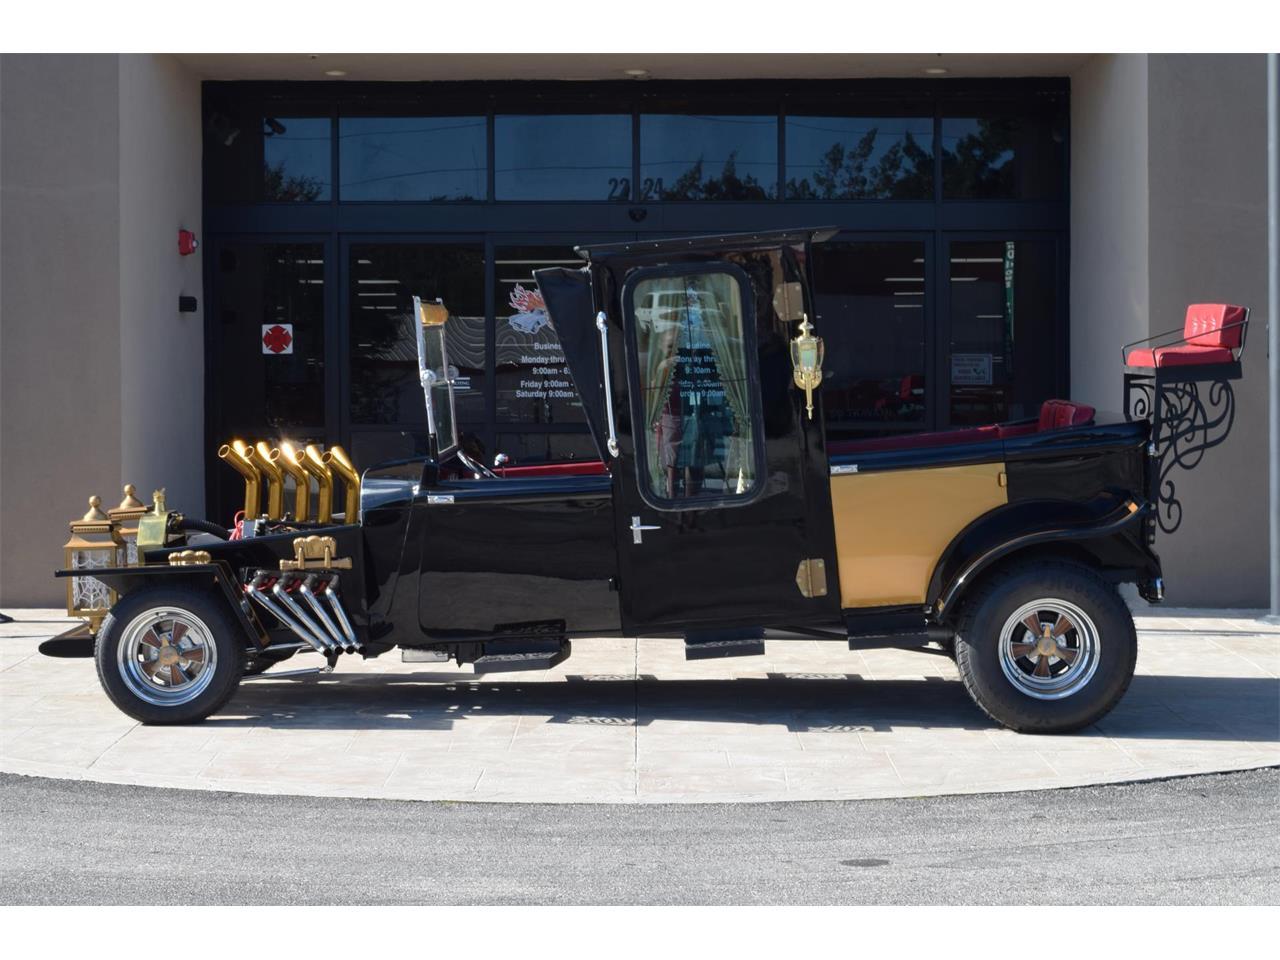 1927 Custom The Munster Koach for Sale | ClicCars.com | CC-1024052 on jimmy buffett golf cart, adaptive golf cart, pinterest golf cart, ds golf cart, latest golf cart, tacoma golf cart, player golf cart, the cube golf cart, google golf cart, riverside golf cart, nashville golf cart, hoover golf cart, 3d golf cart, enterprise golf cart, alabama golf cart, ocala golf cart, cheapest golf cart, world's fastest golf cart, tumblr golf cart, portable golf cart,